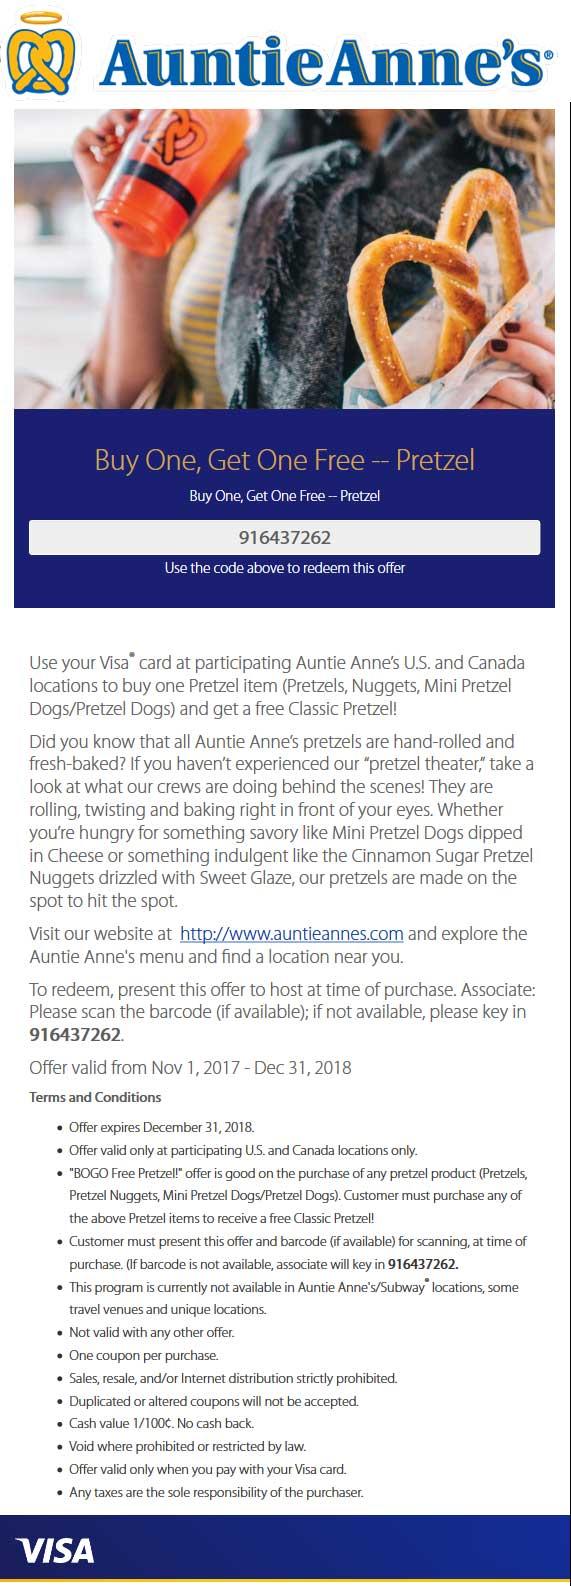 Auntie Annes Coupon March 2019 Second pretzel free at Auntie Annes restaurants